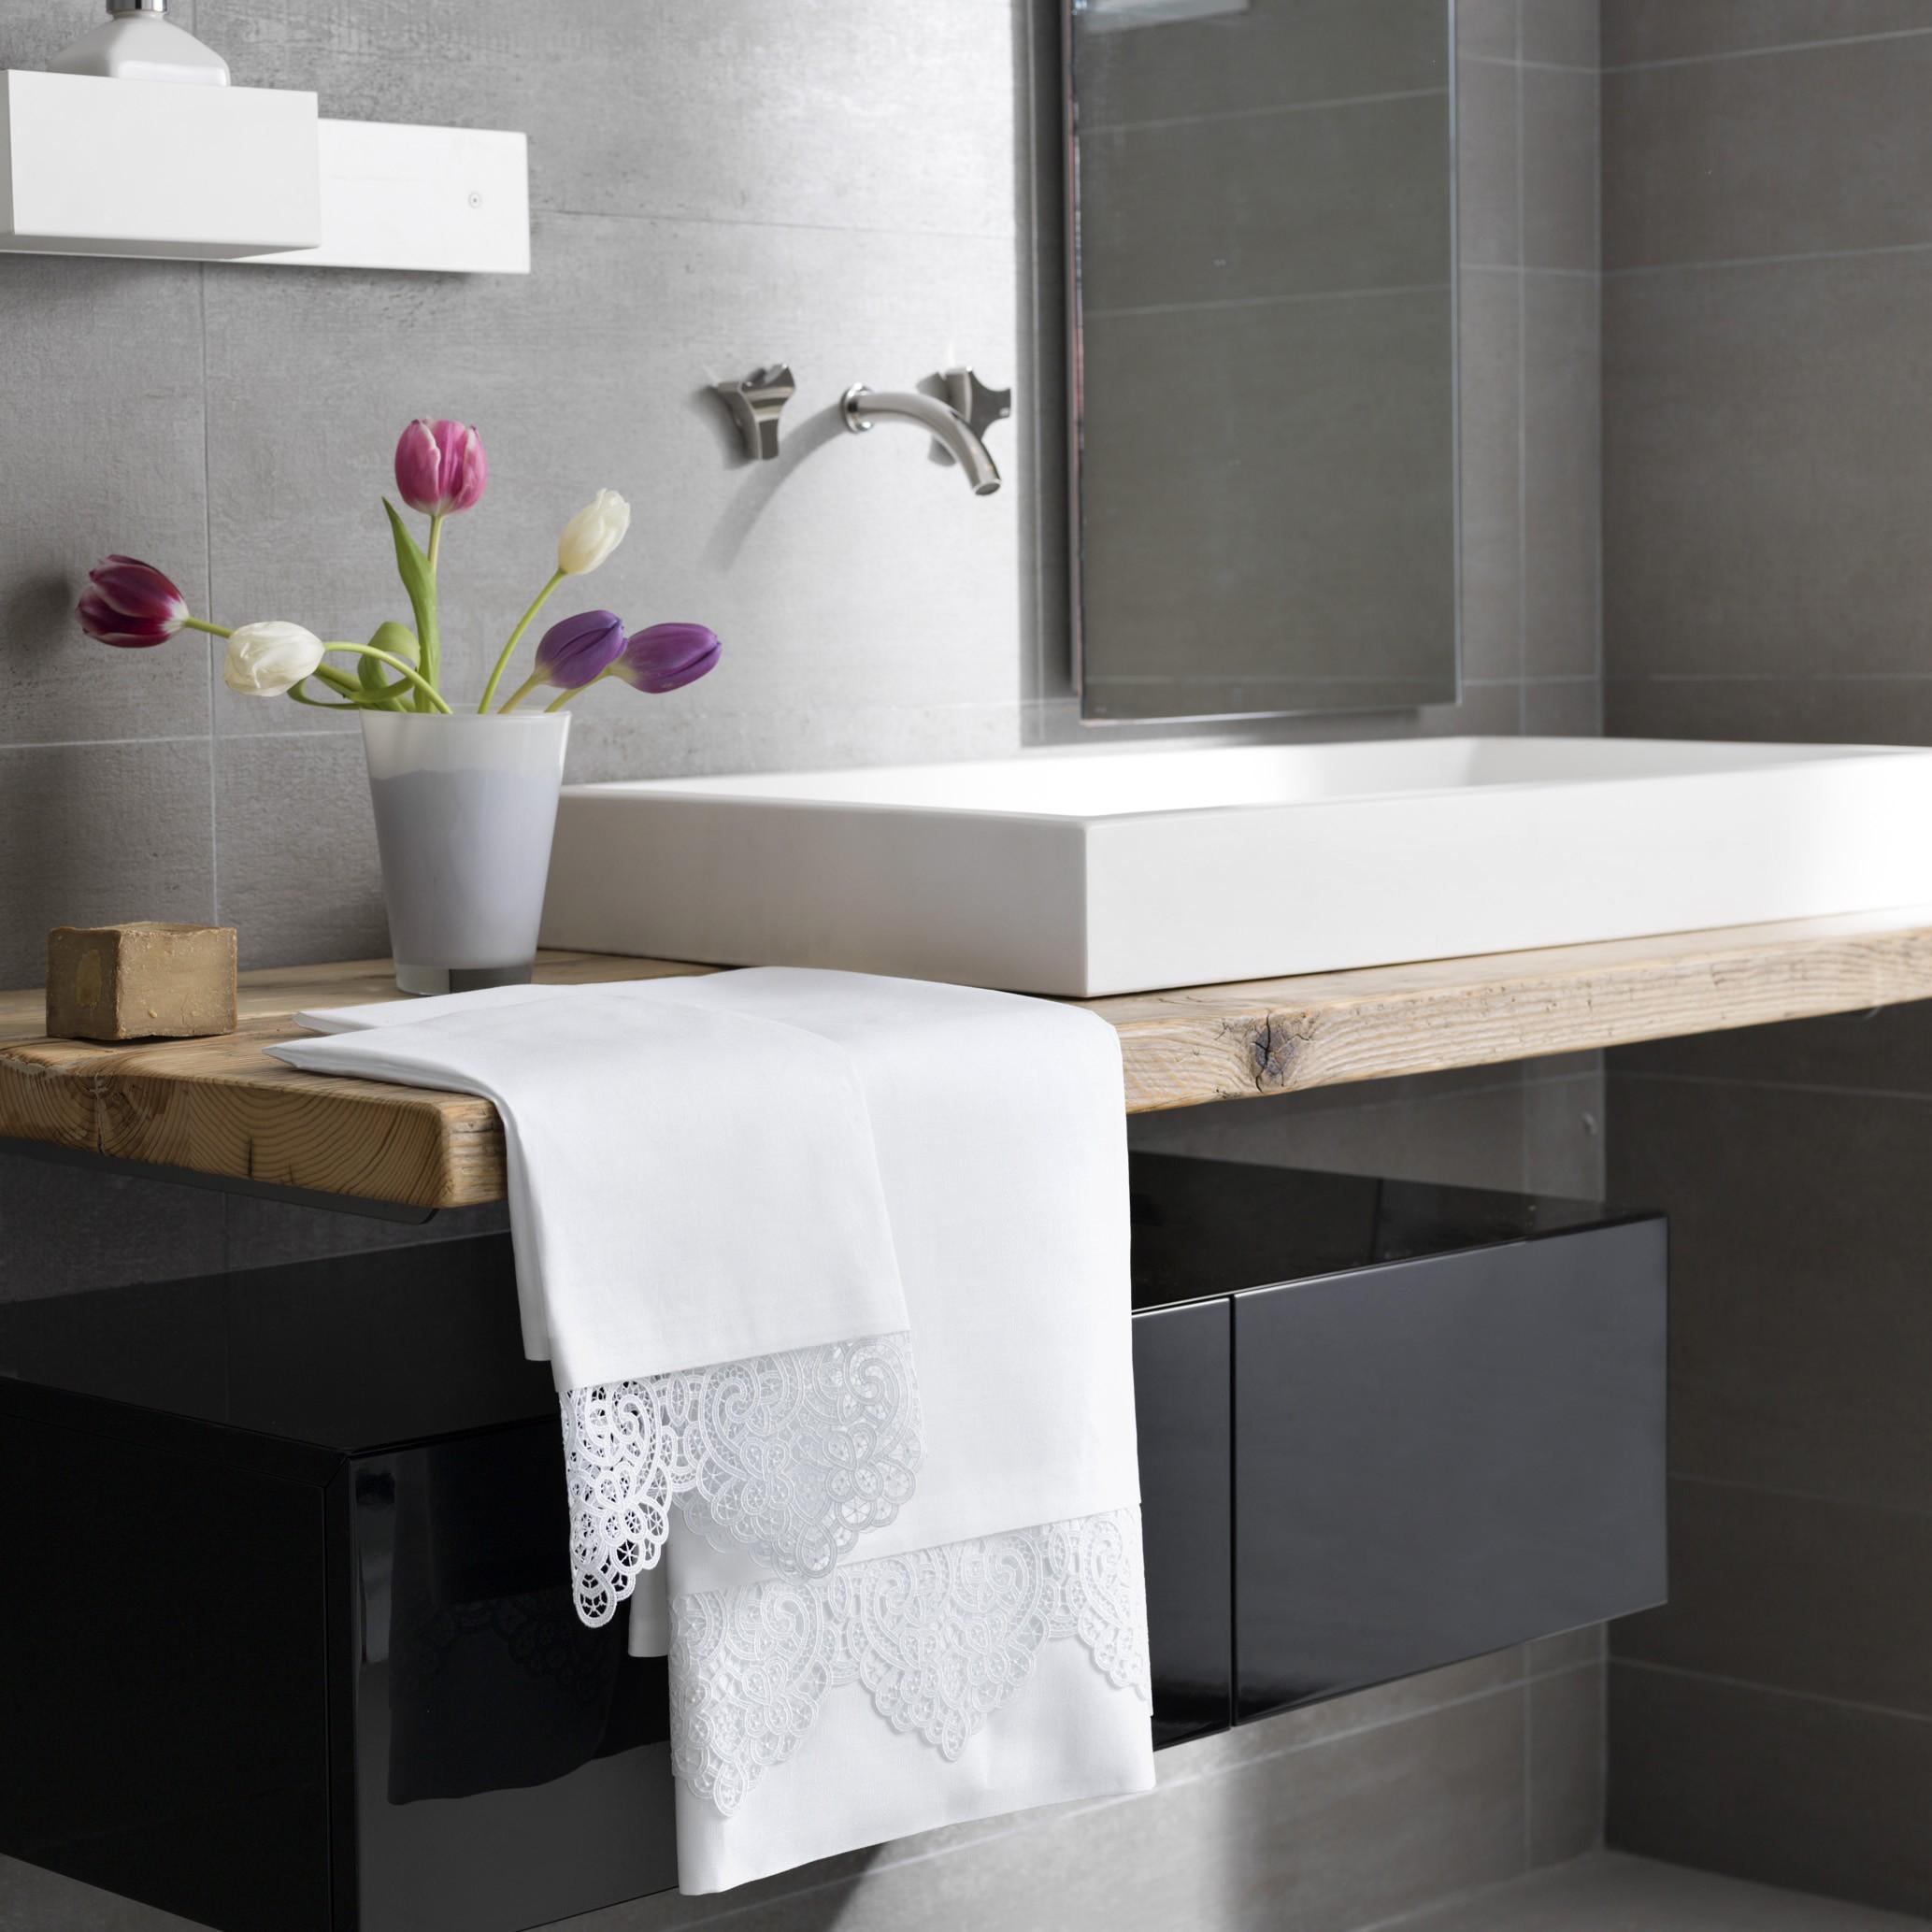 Asciugamani e biancheria da bagno – Arnaldo Caprai - Arnaldo ...